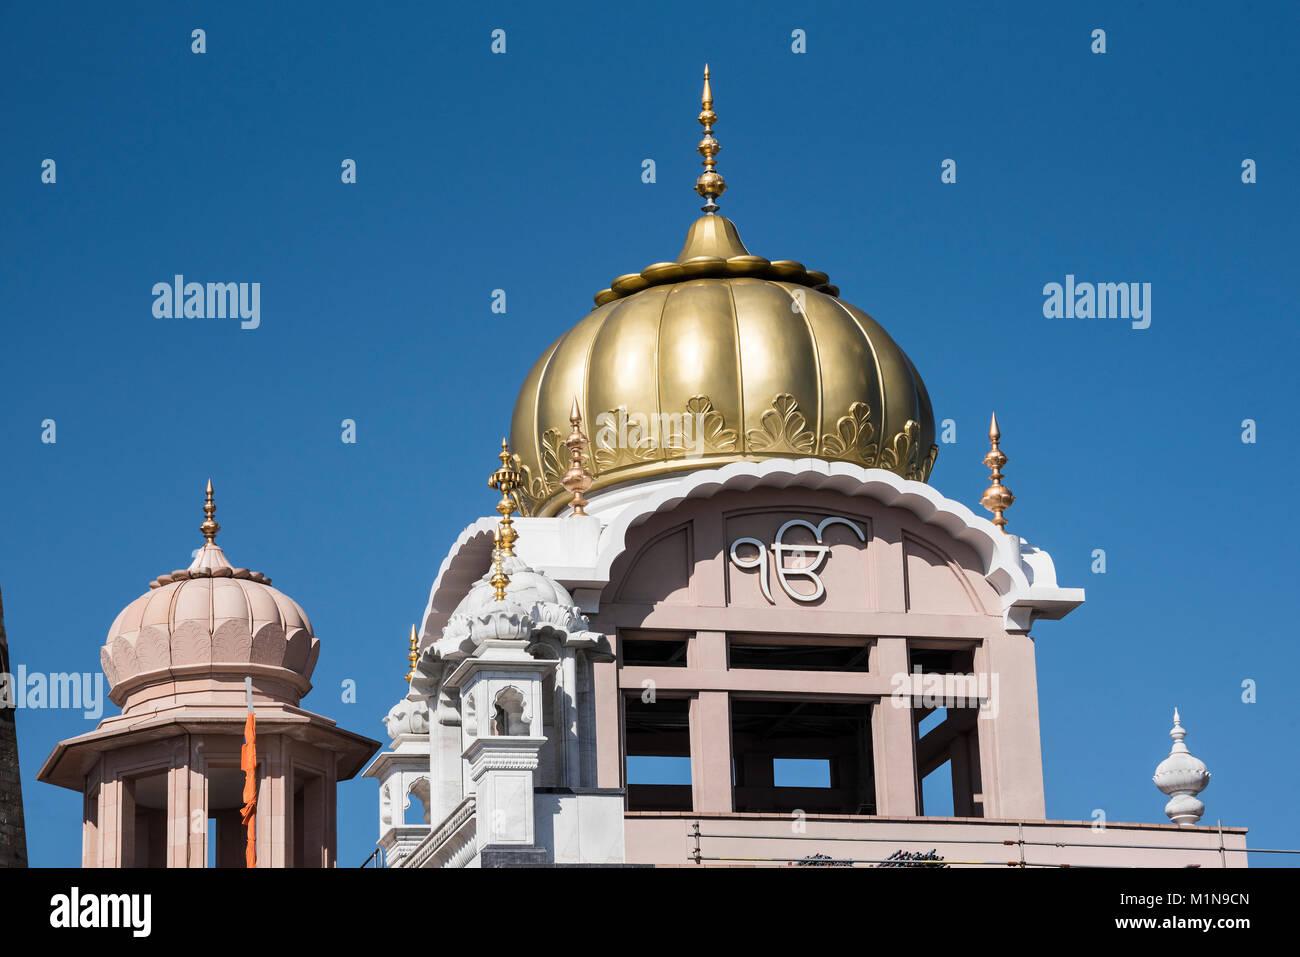 Skyline of the Gurdwara Singh Sabha Glasgow. - Stock Image